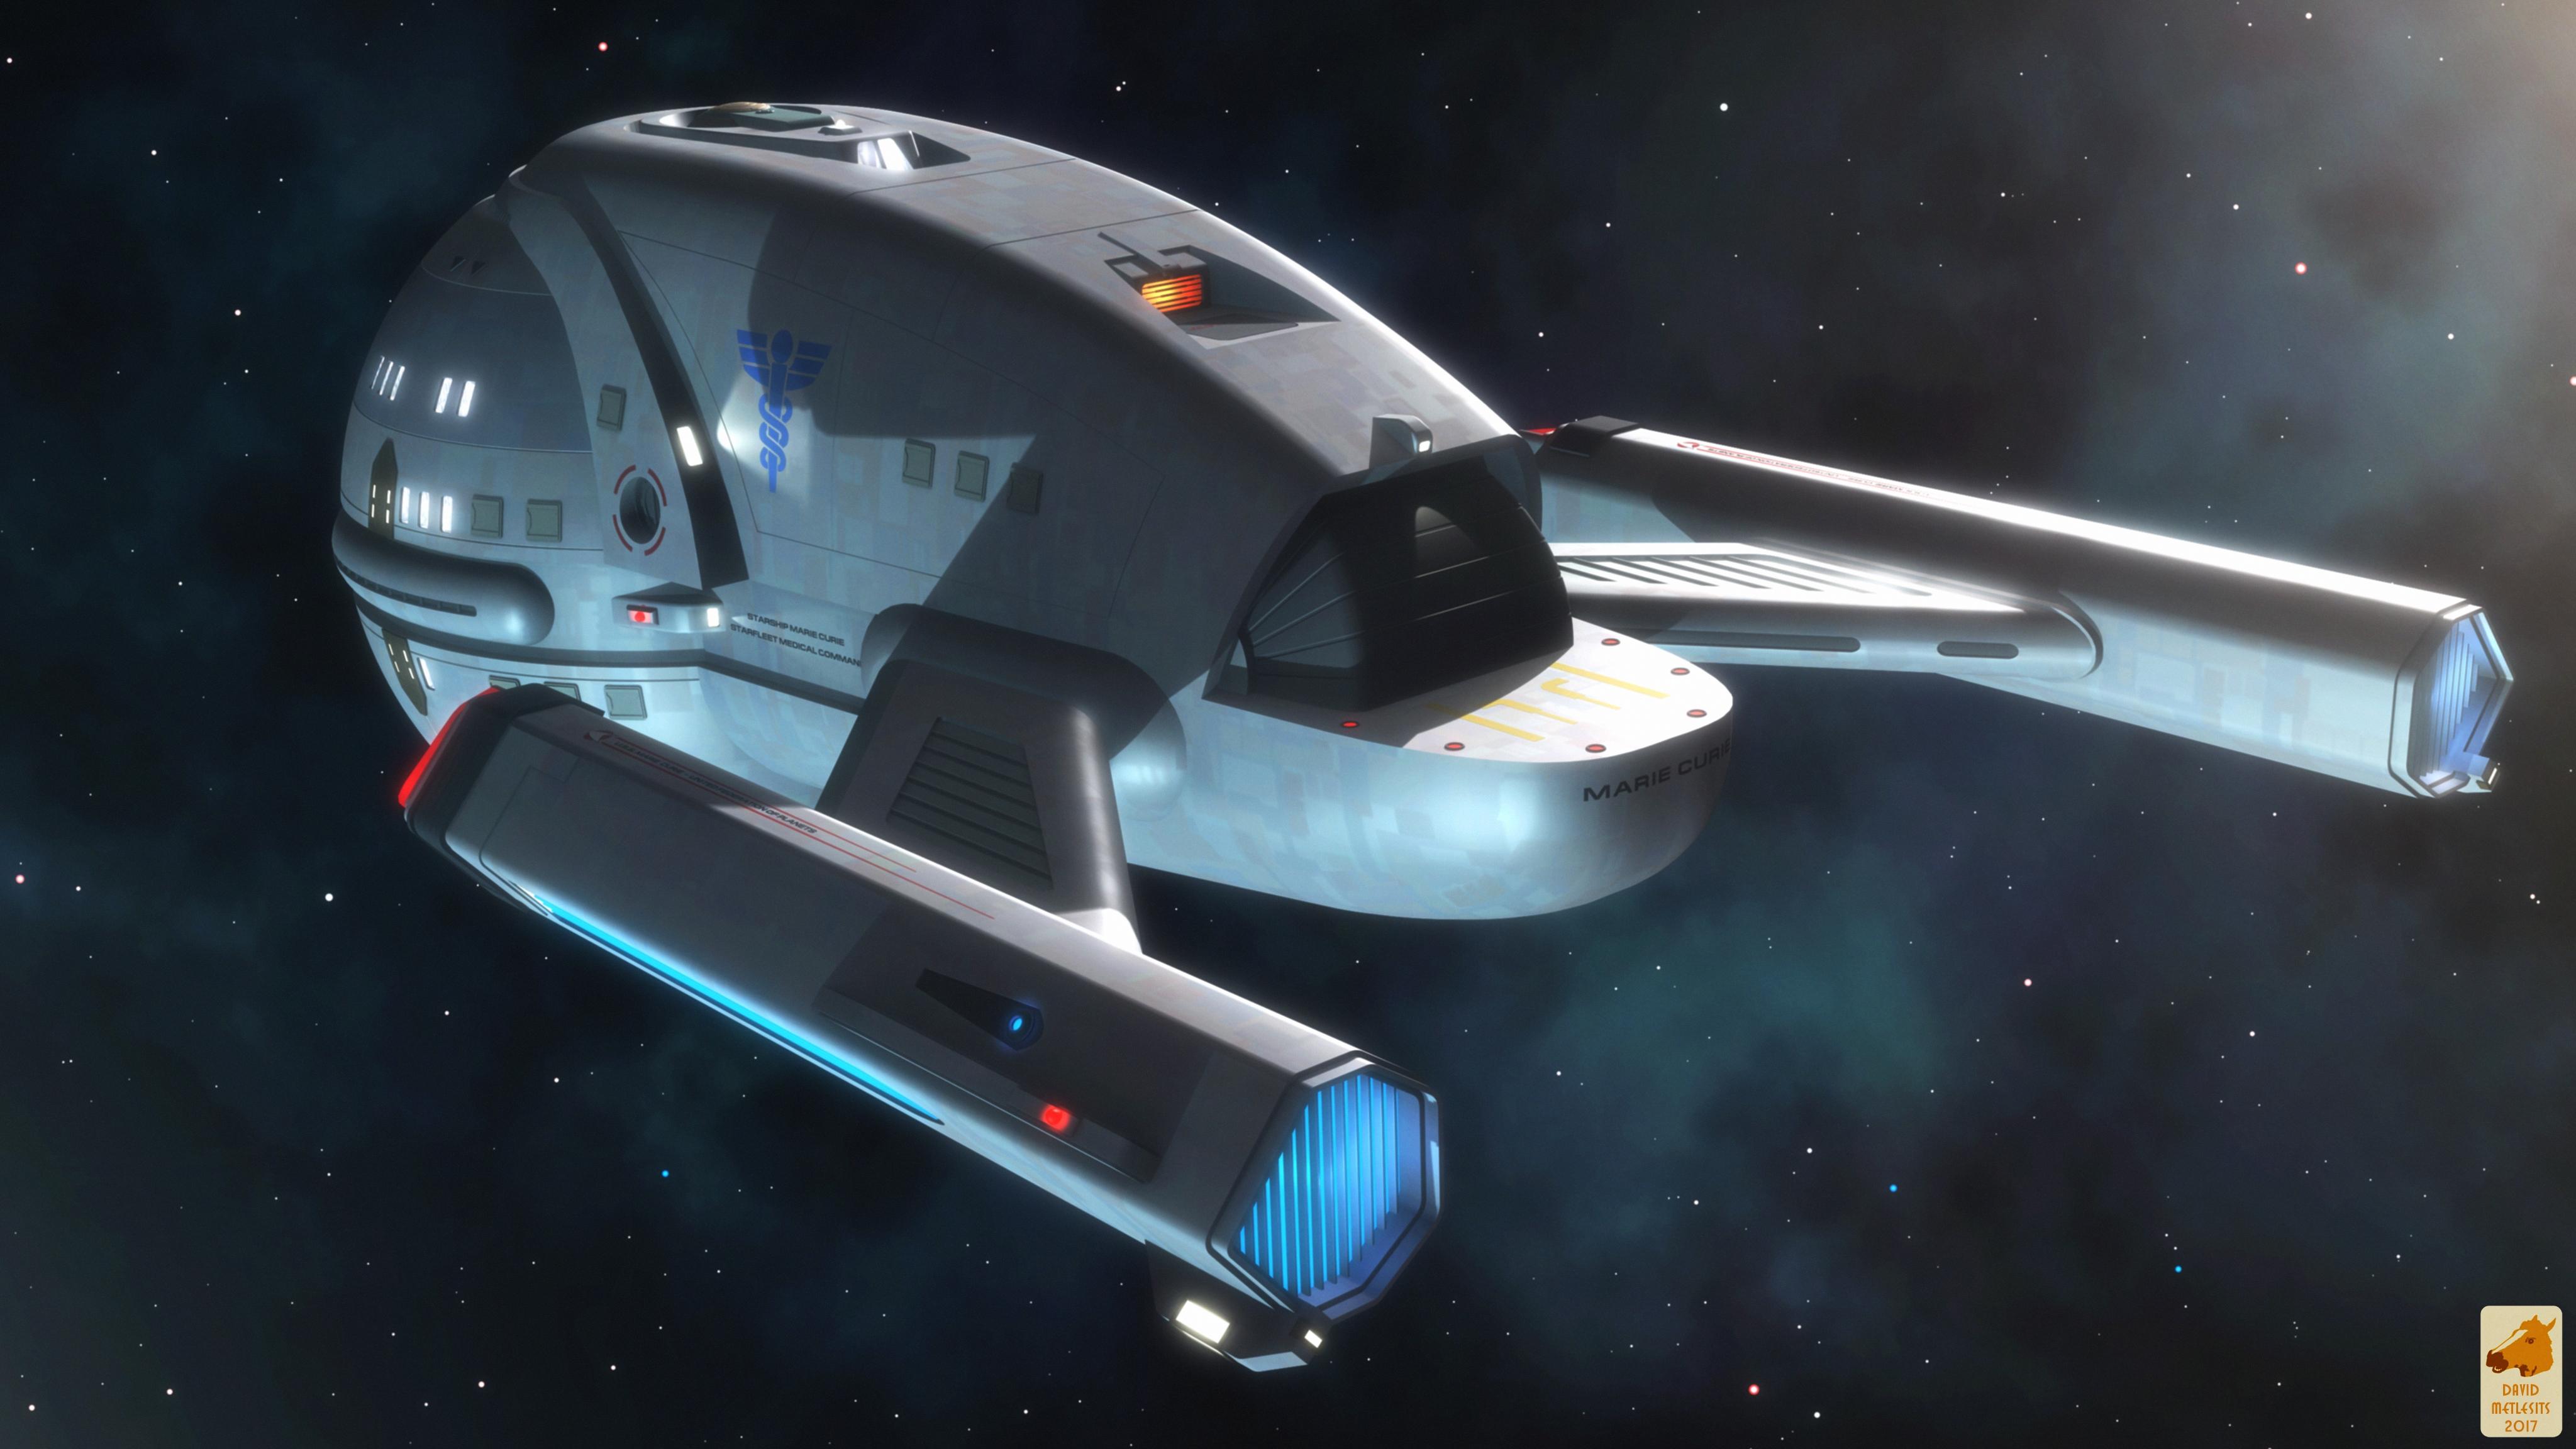 Space ambulance van by thefirstfleet